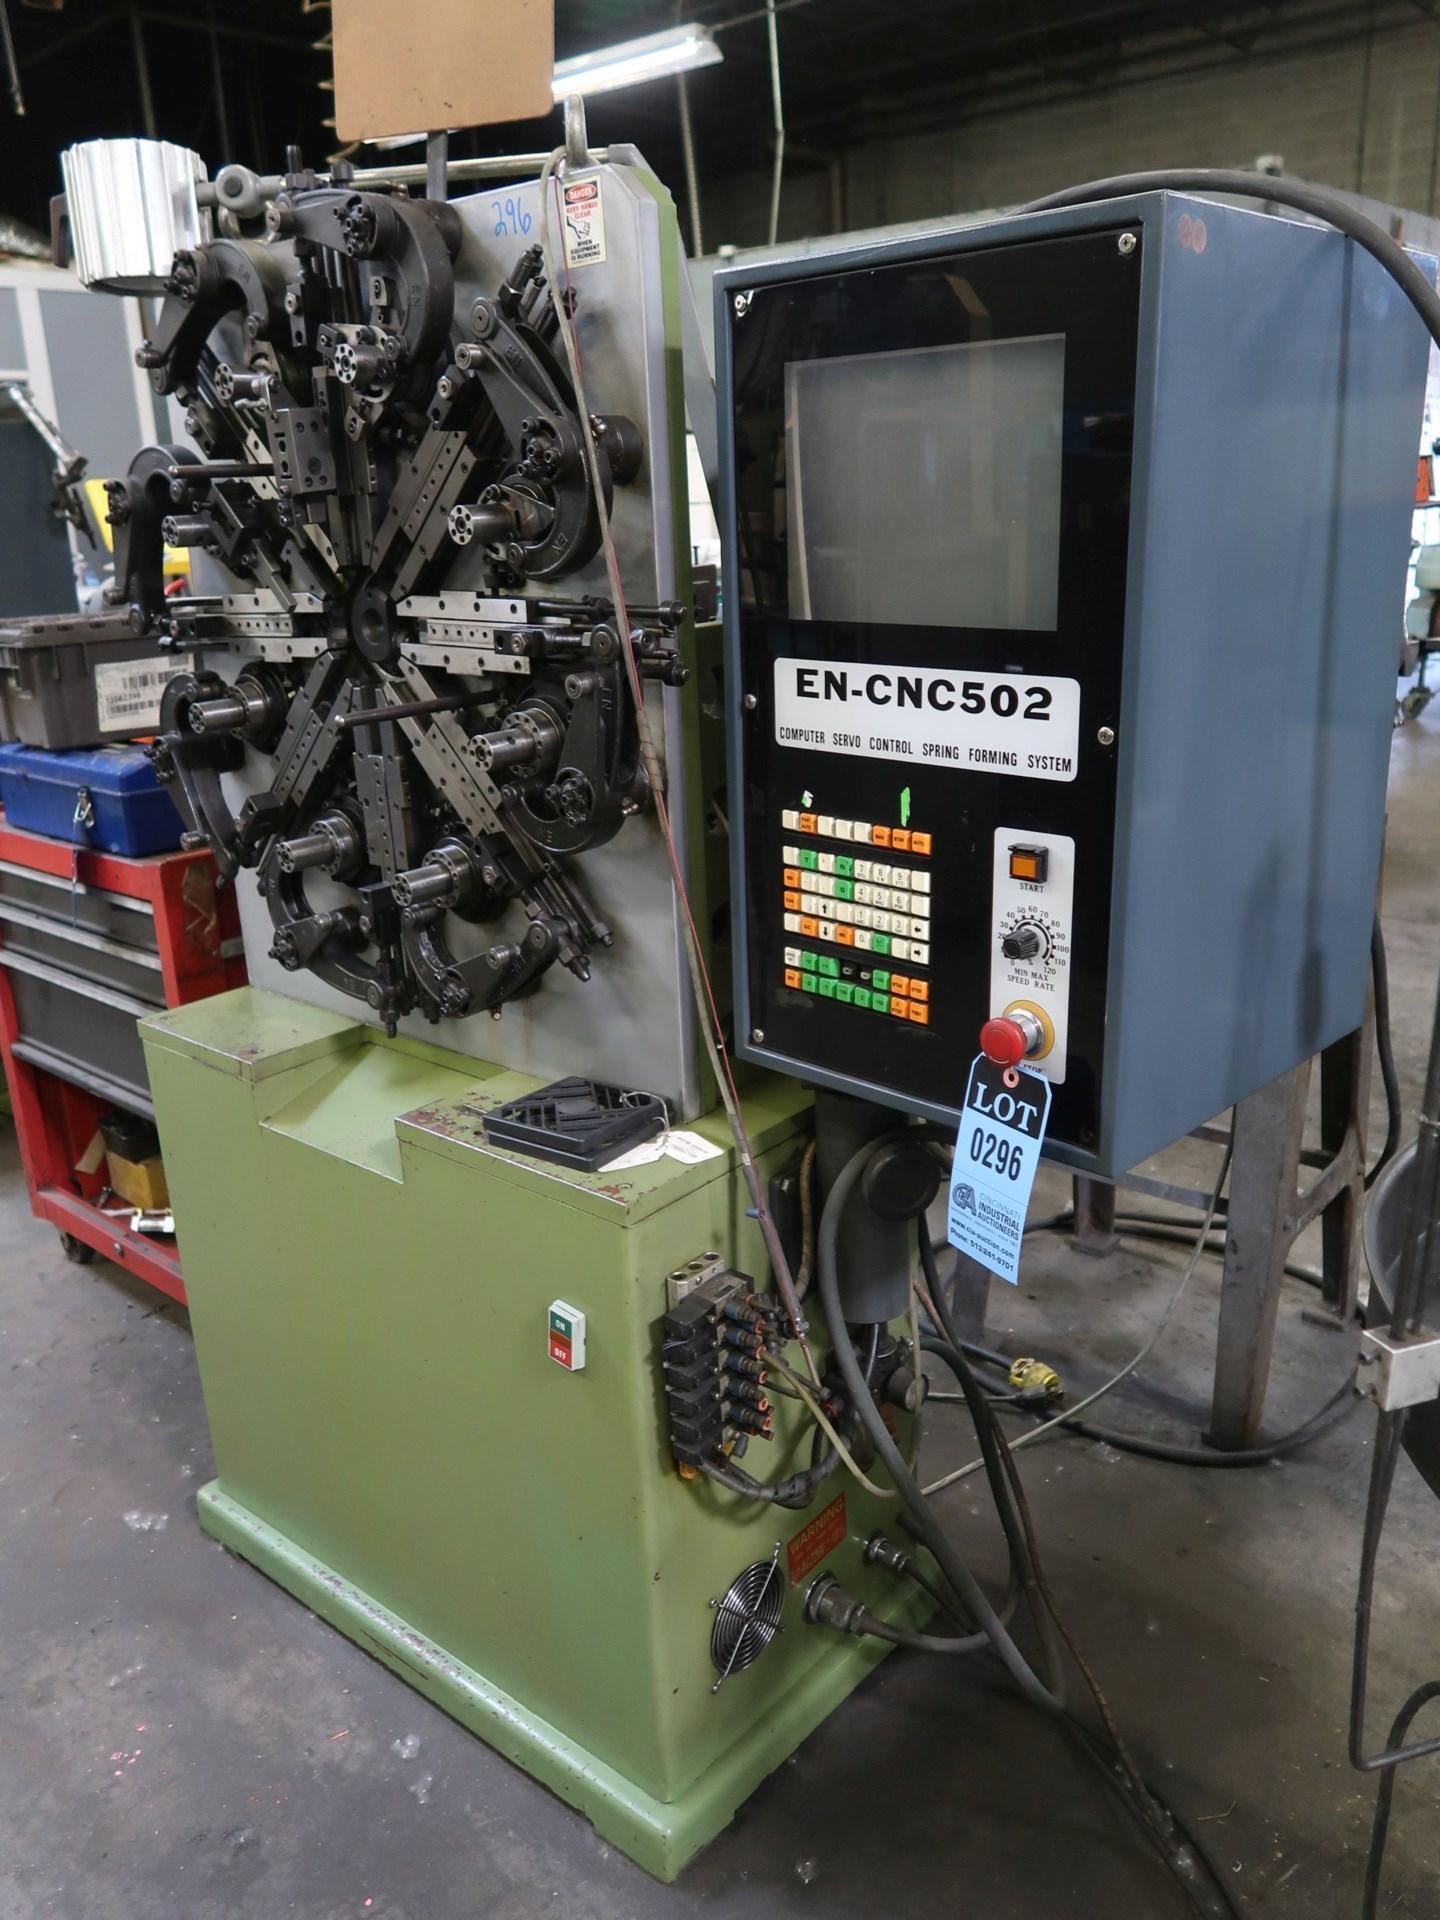 EN-CNC-502 ELECTRICALCNC SPRING FORMING MACHINE: STOCK #10773